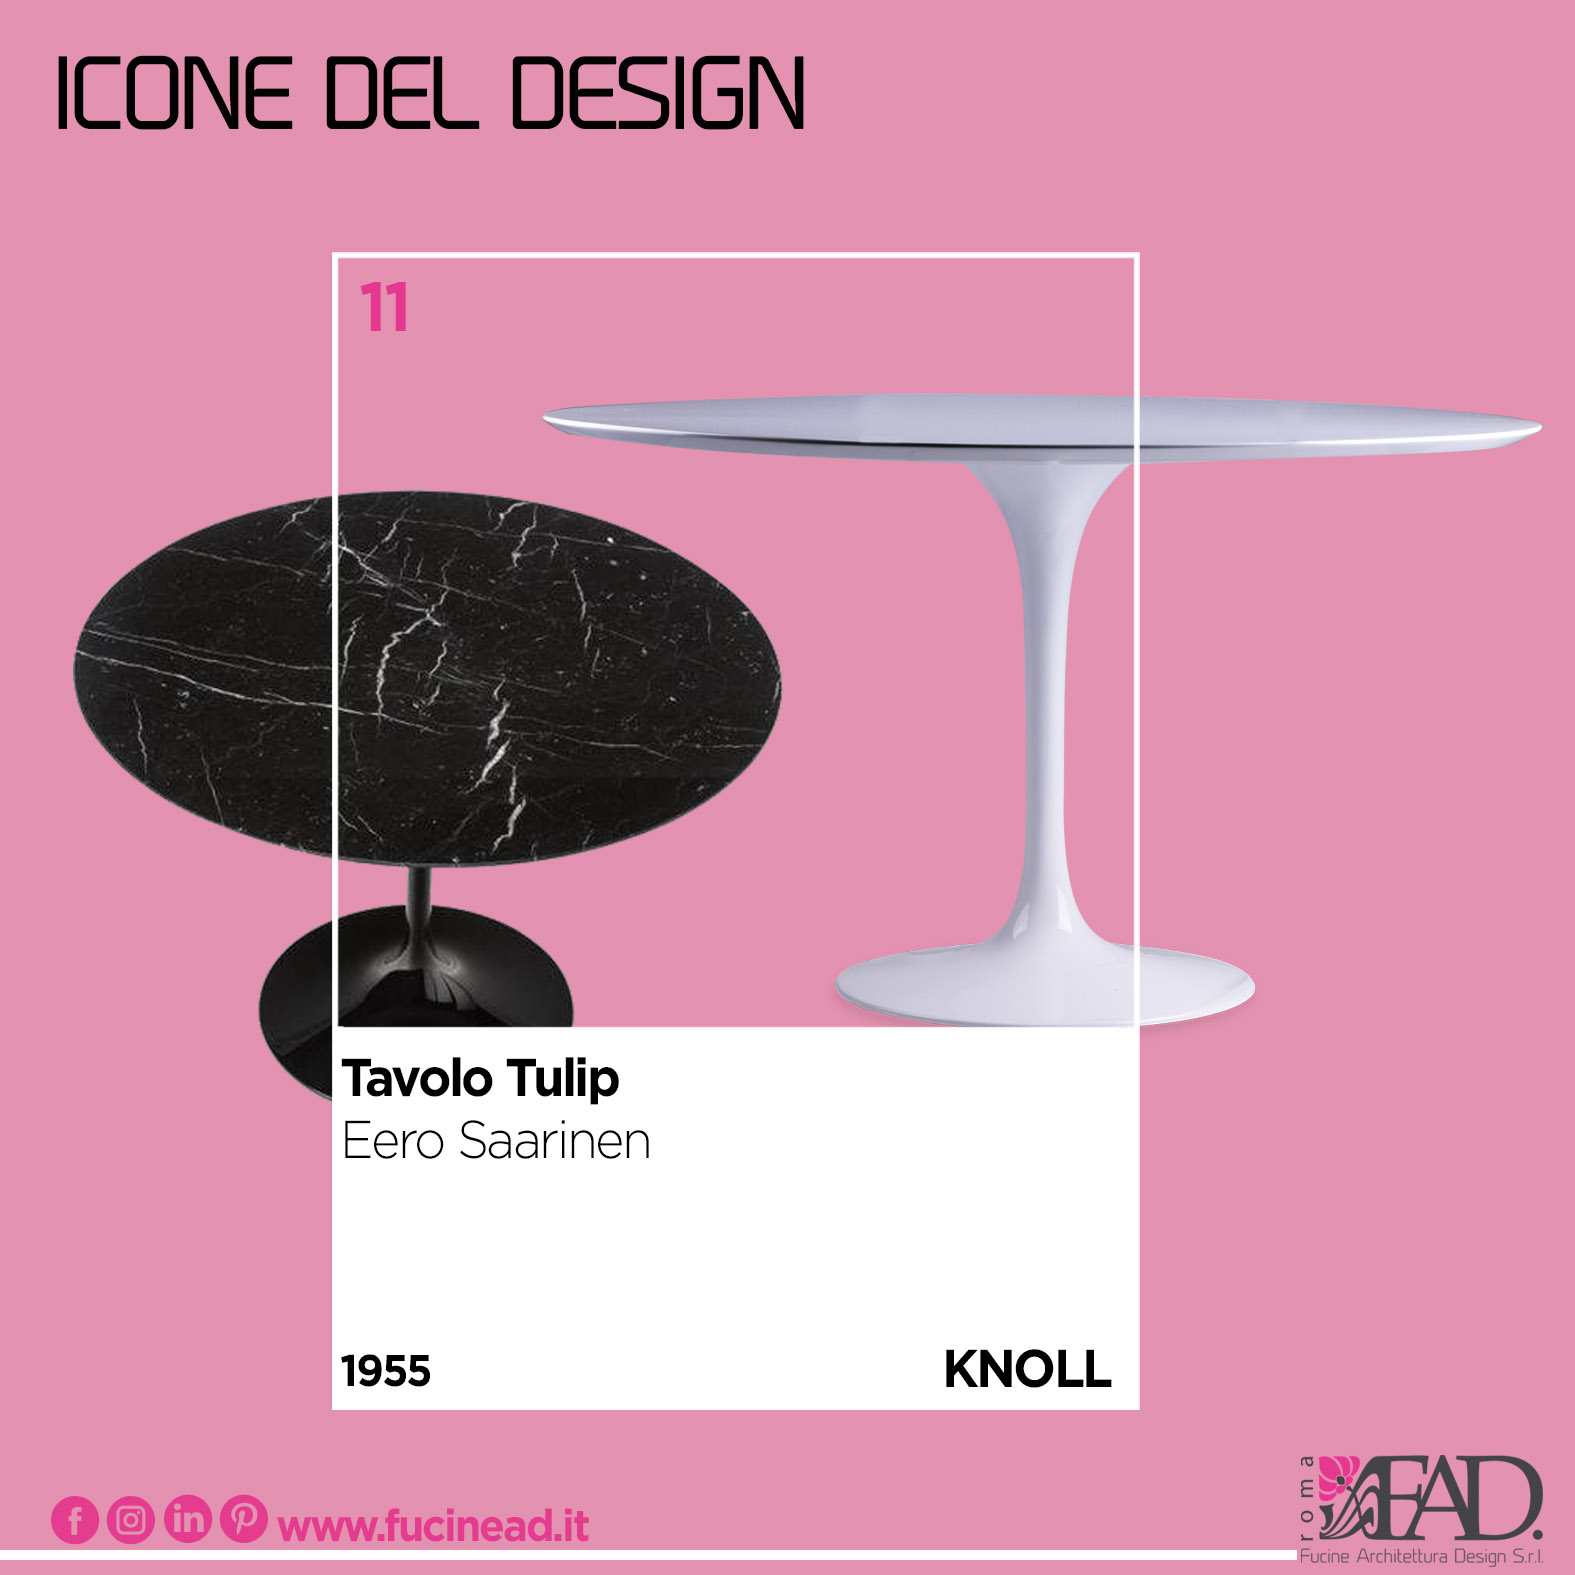 Tavolo Tulip